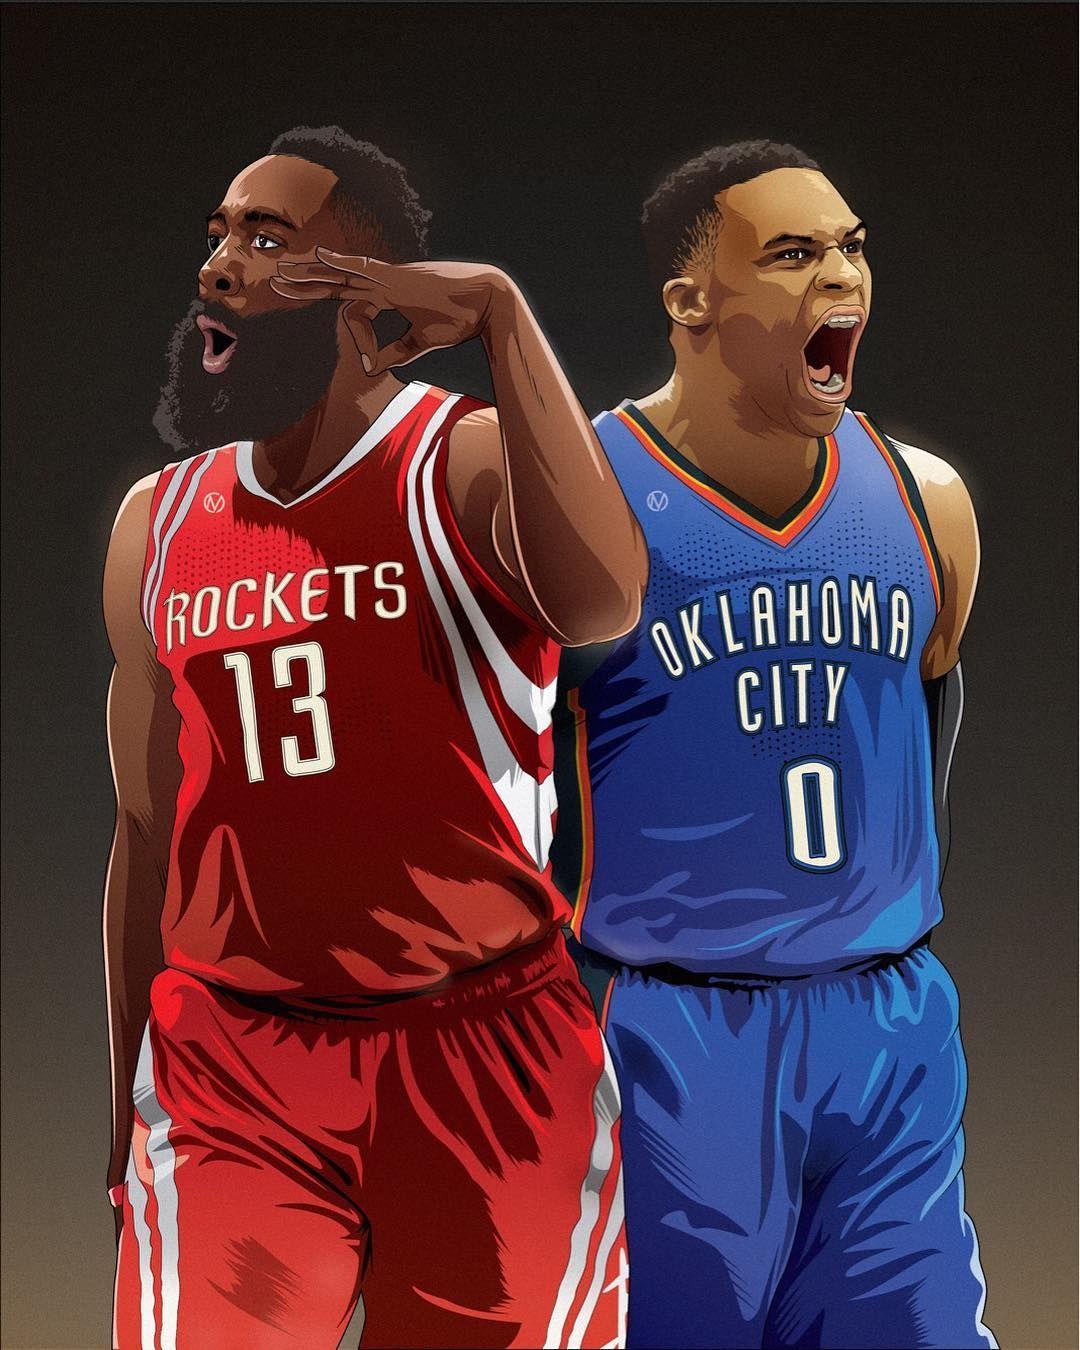 Cool Basketball Wallpapers: Nba Pictures, Sports Basketball, Nba Players